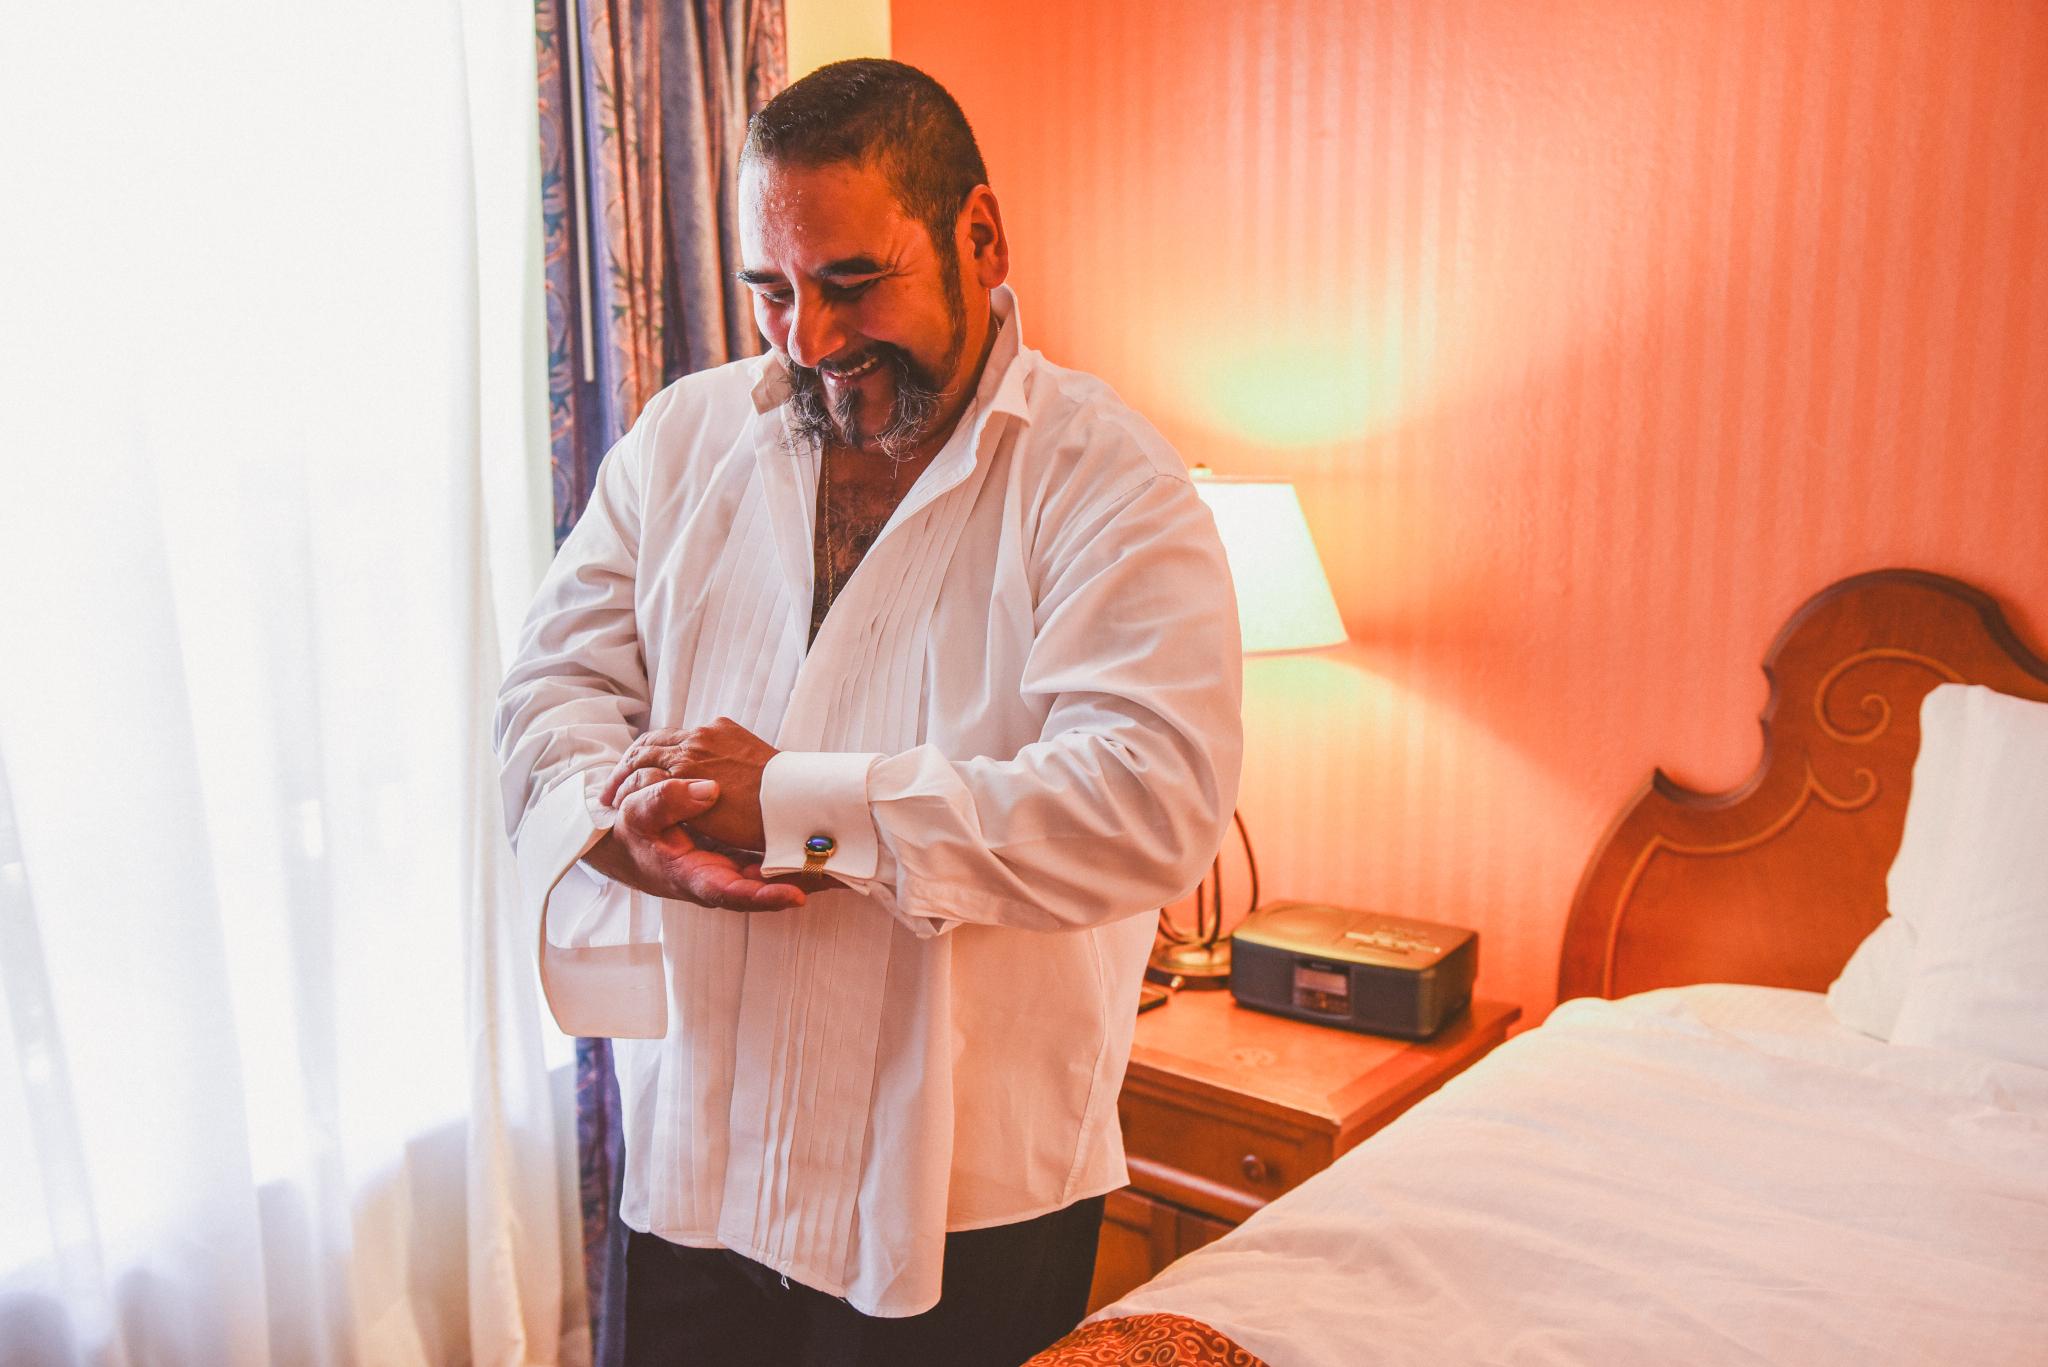 san diego wedding   photographer   man putting on white button down shirt smiling looking down